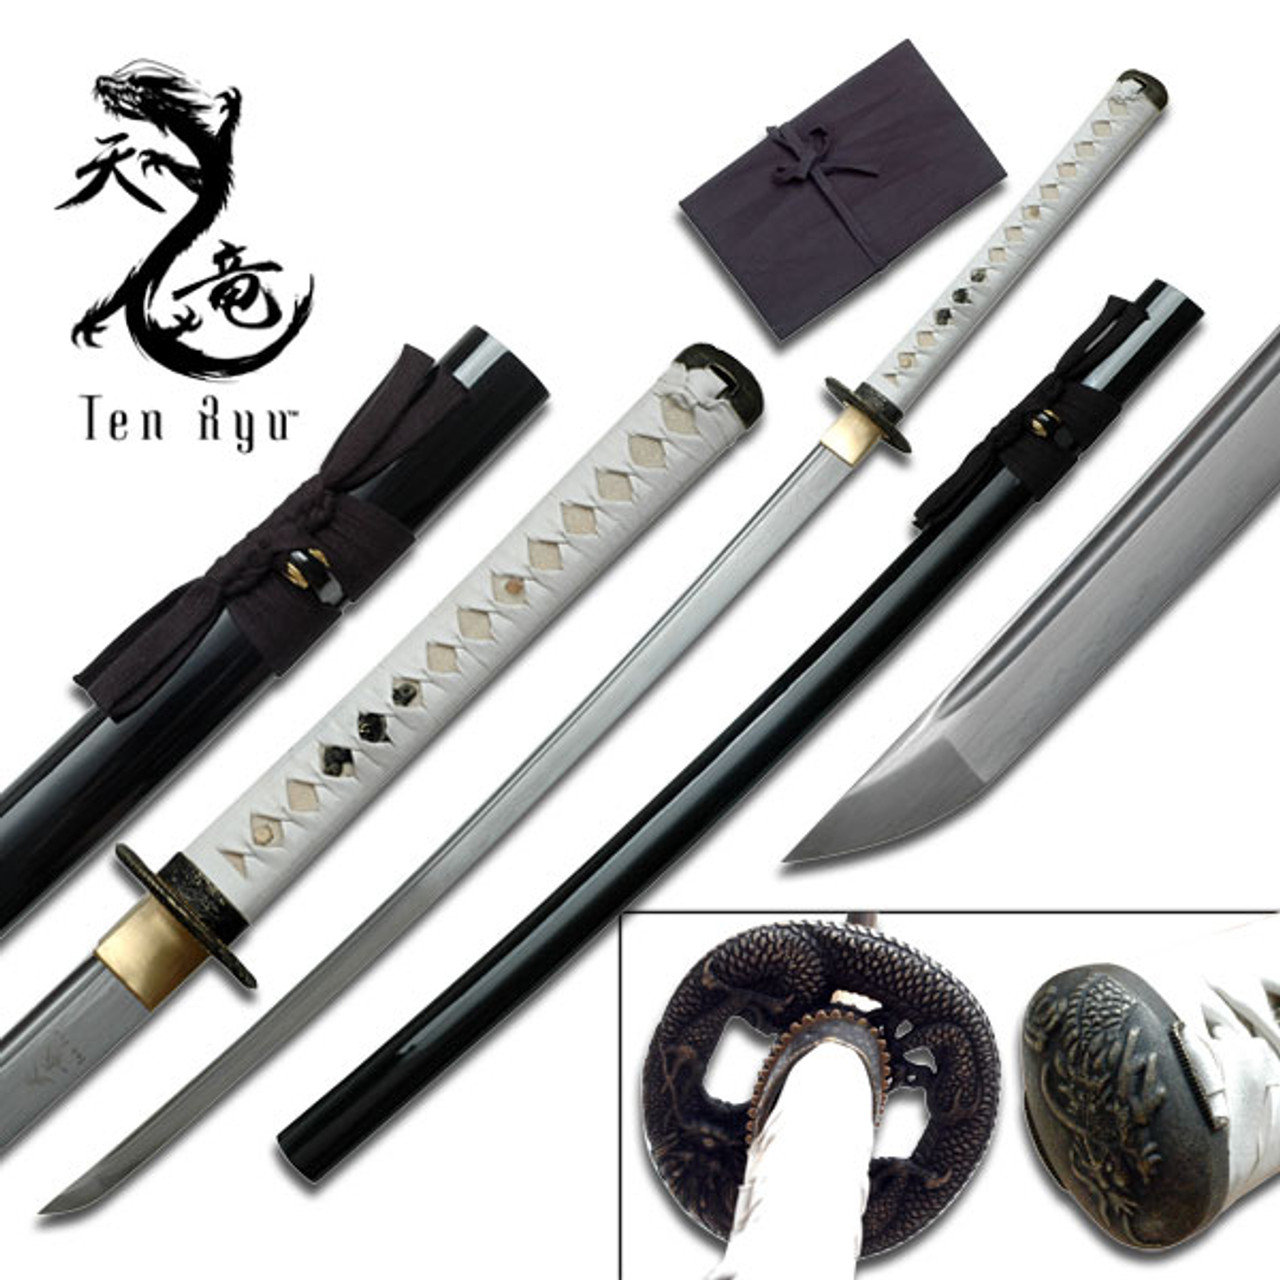 Ten Ryu - Sharp Damascus Steel Katana Sword (White Handle)